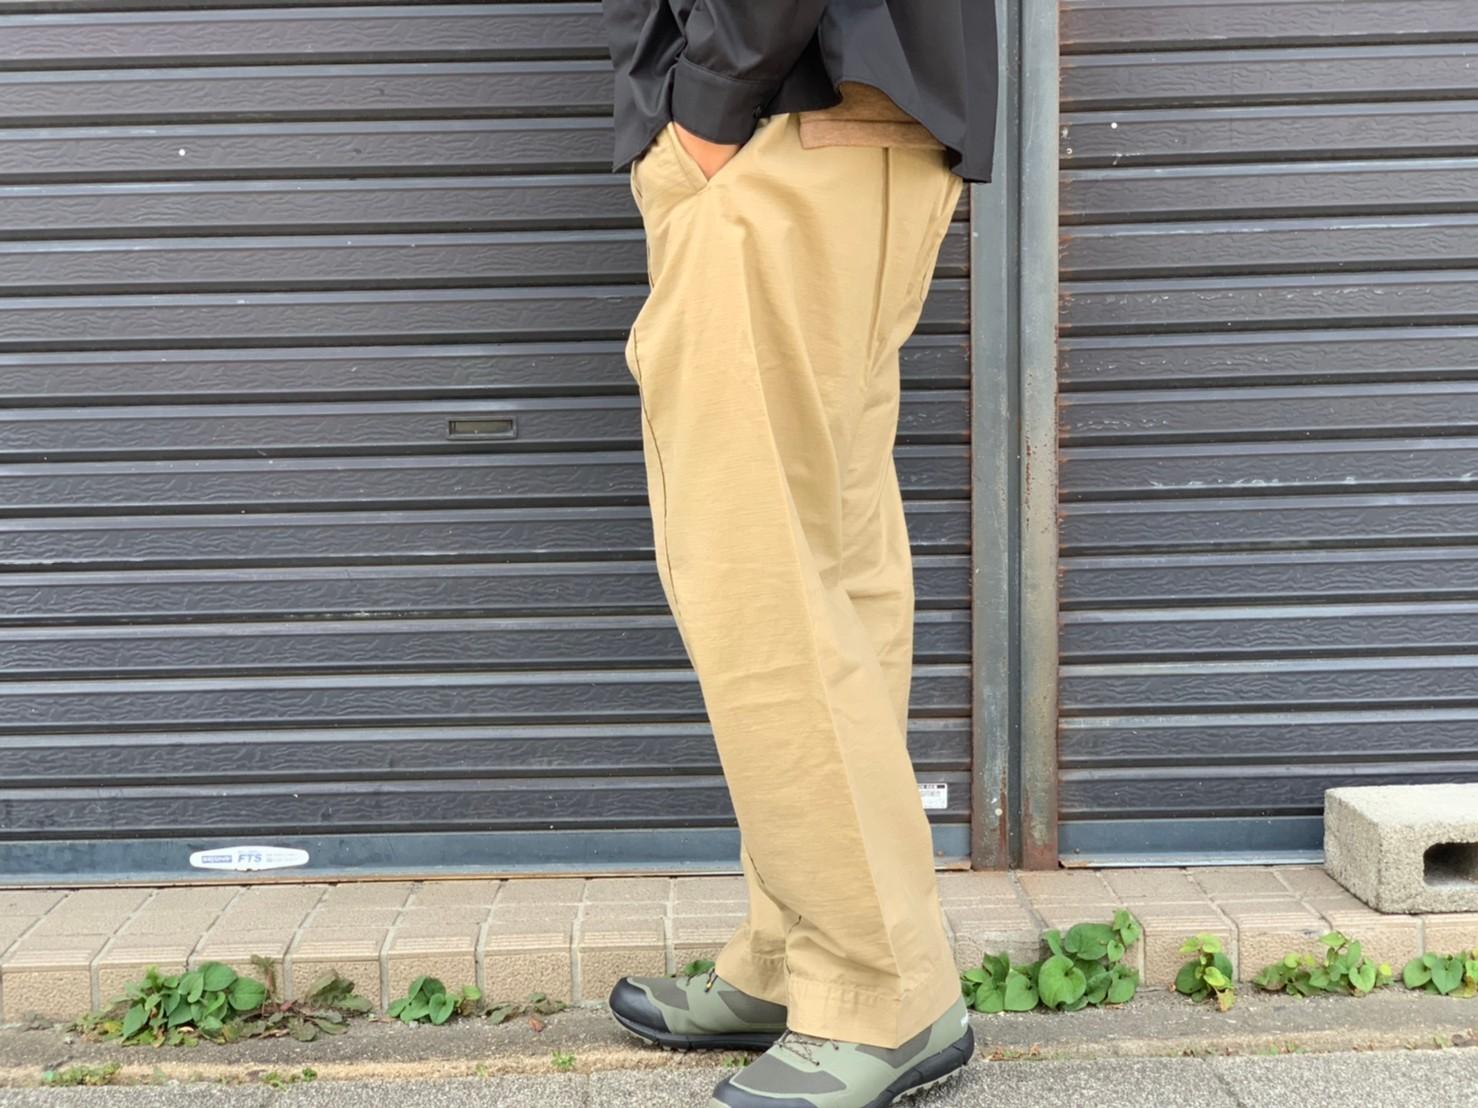 "\""JieDa\""<<T/C FLAP SHIRT>>Style~NORI~_c0167336_16545920.jpg"